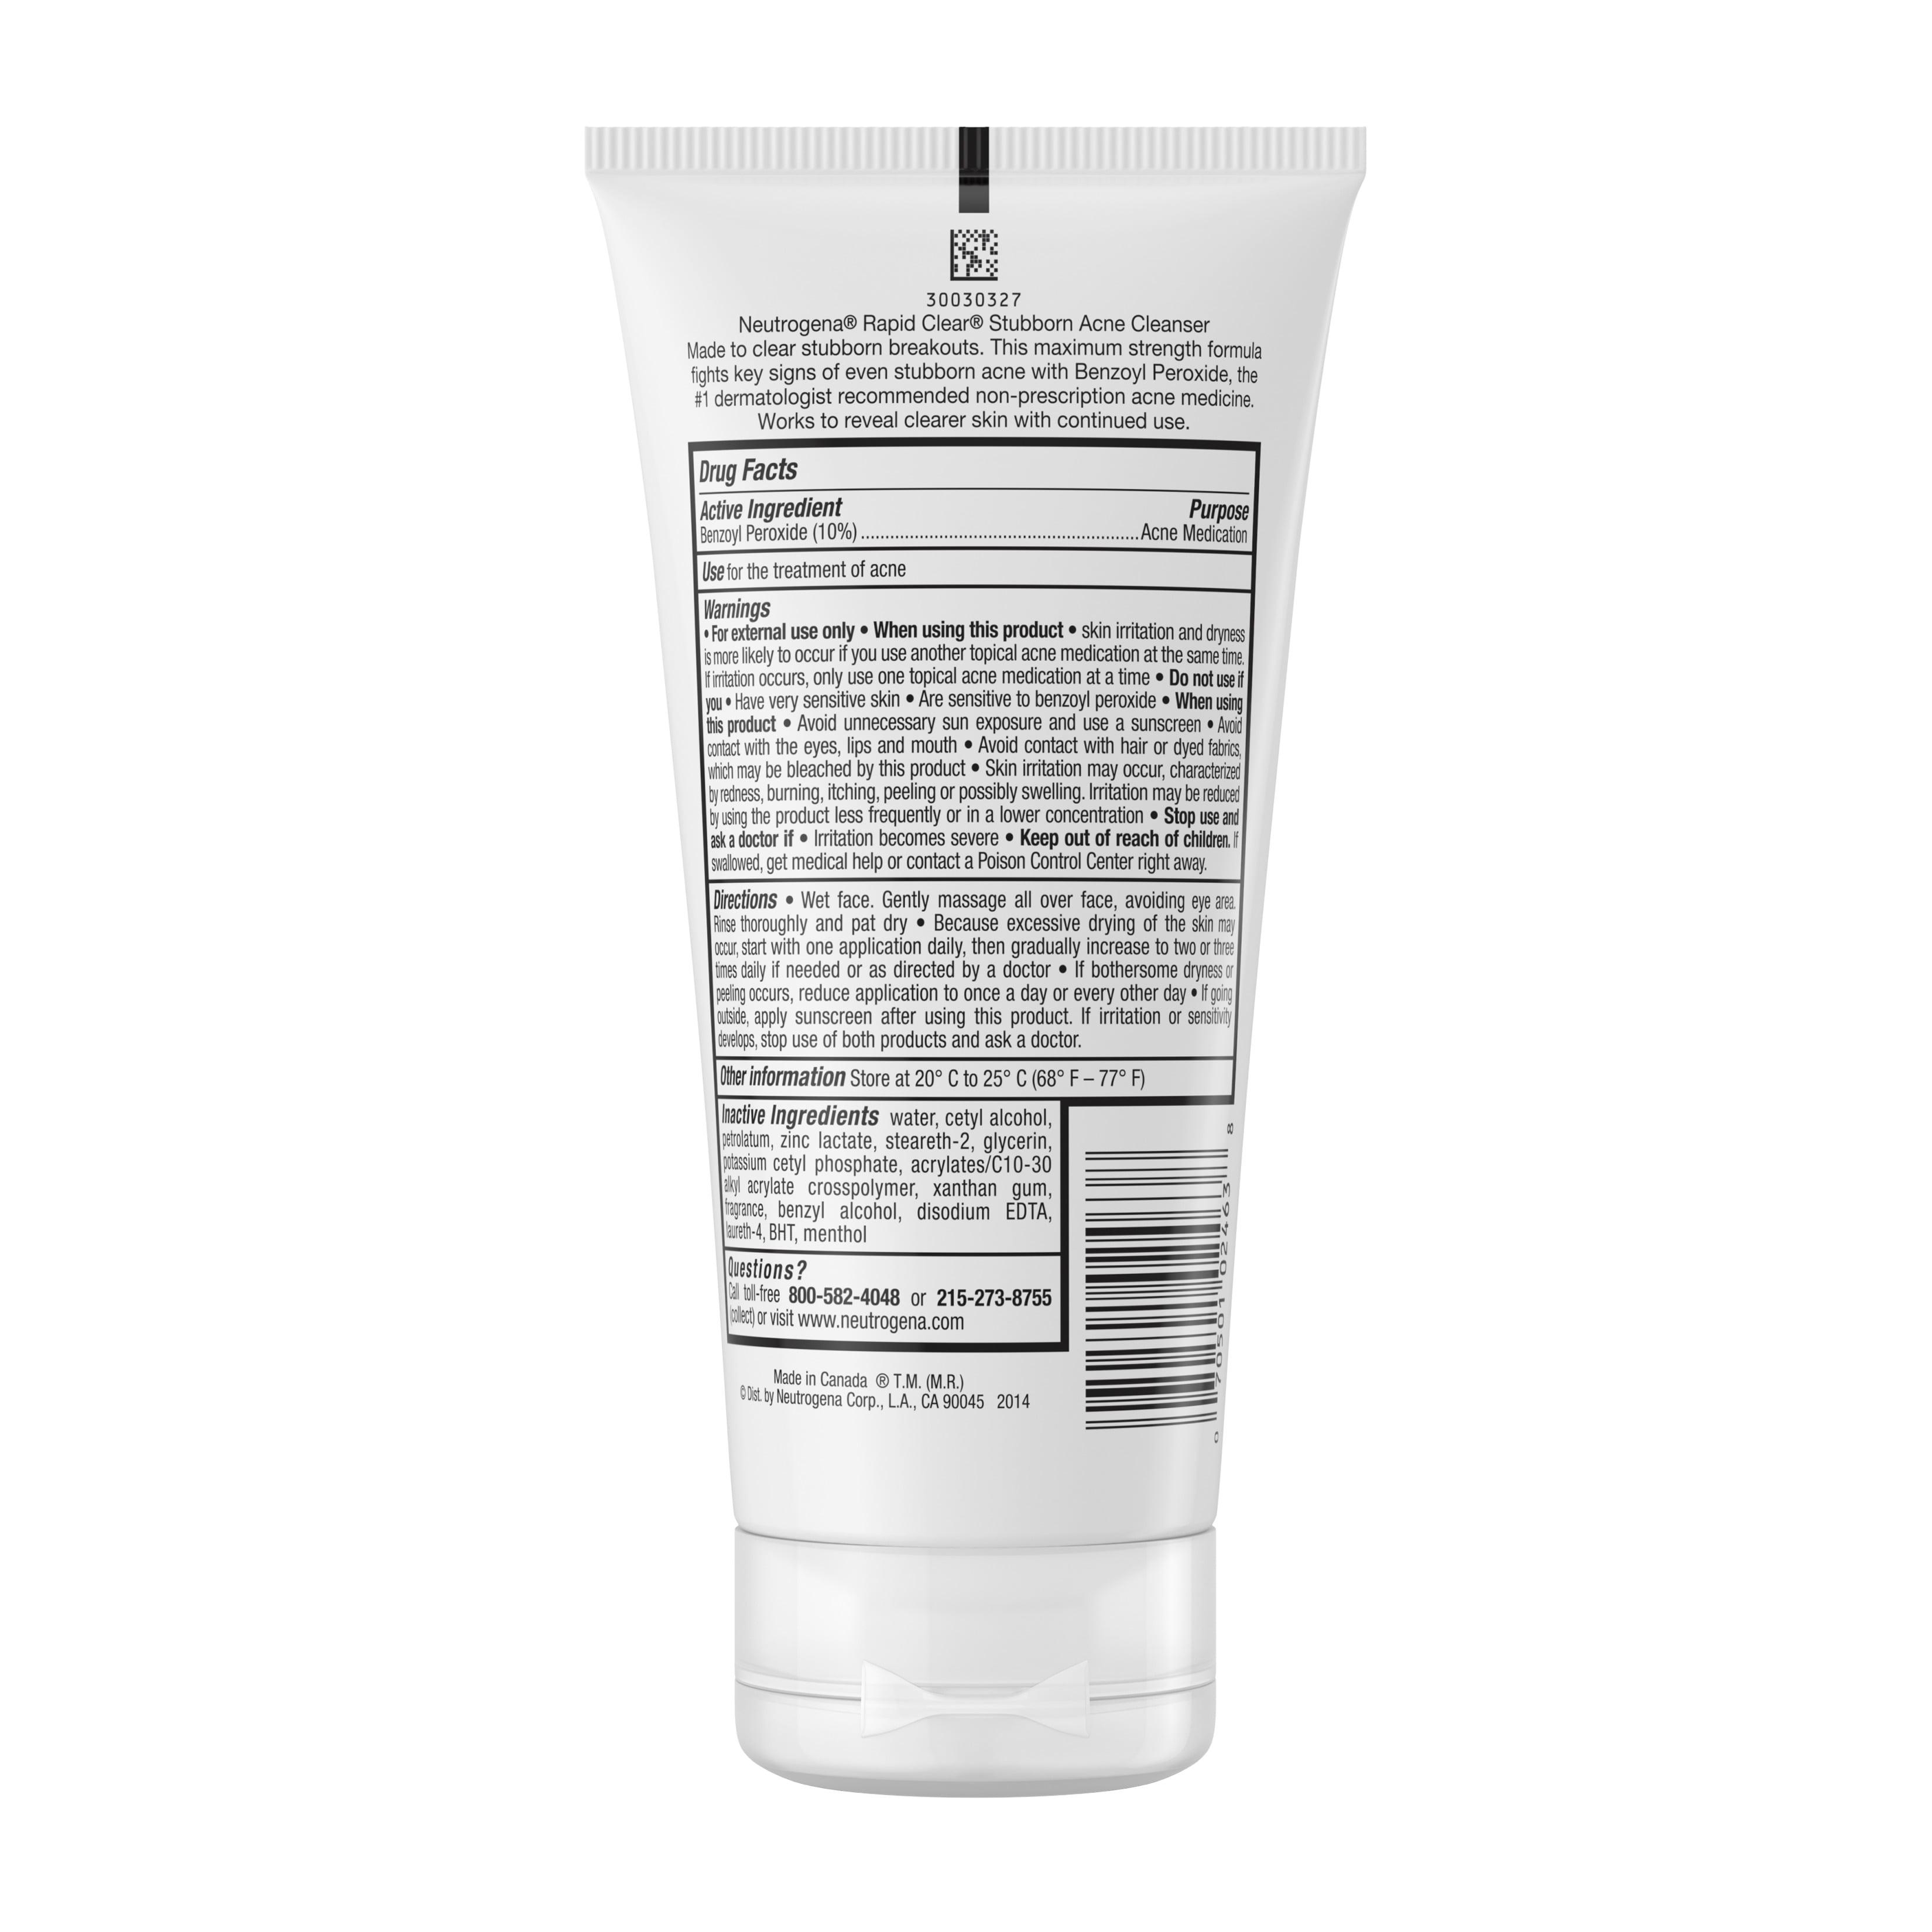 Neutrogena Rapid Clear Stubborn Daily Acne Facial Cleanser 5 Fl